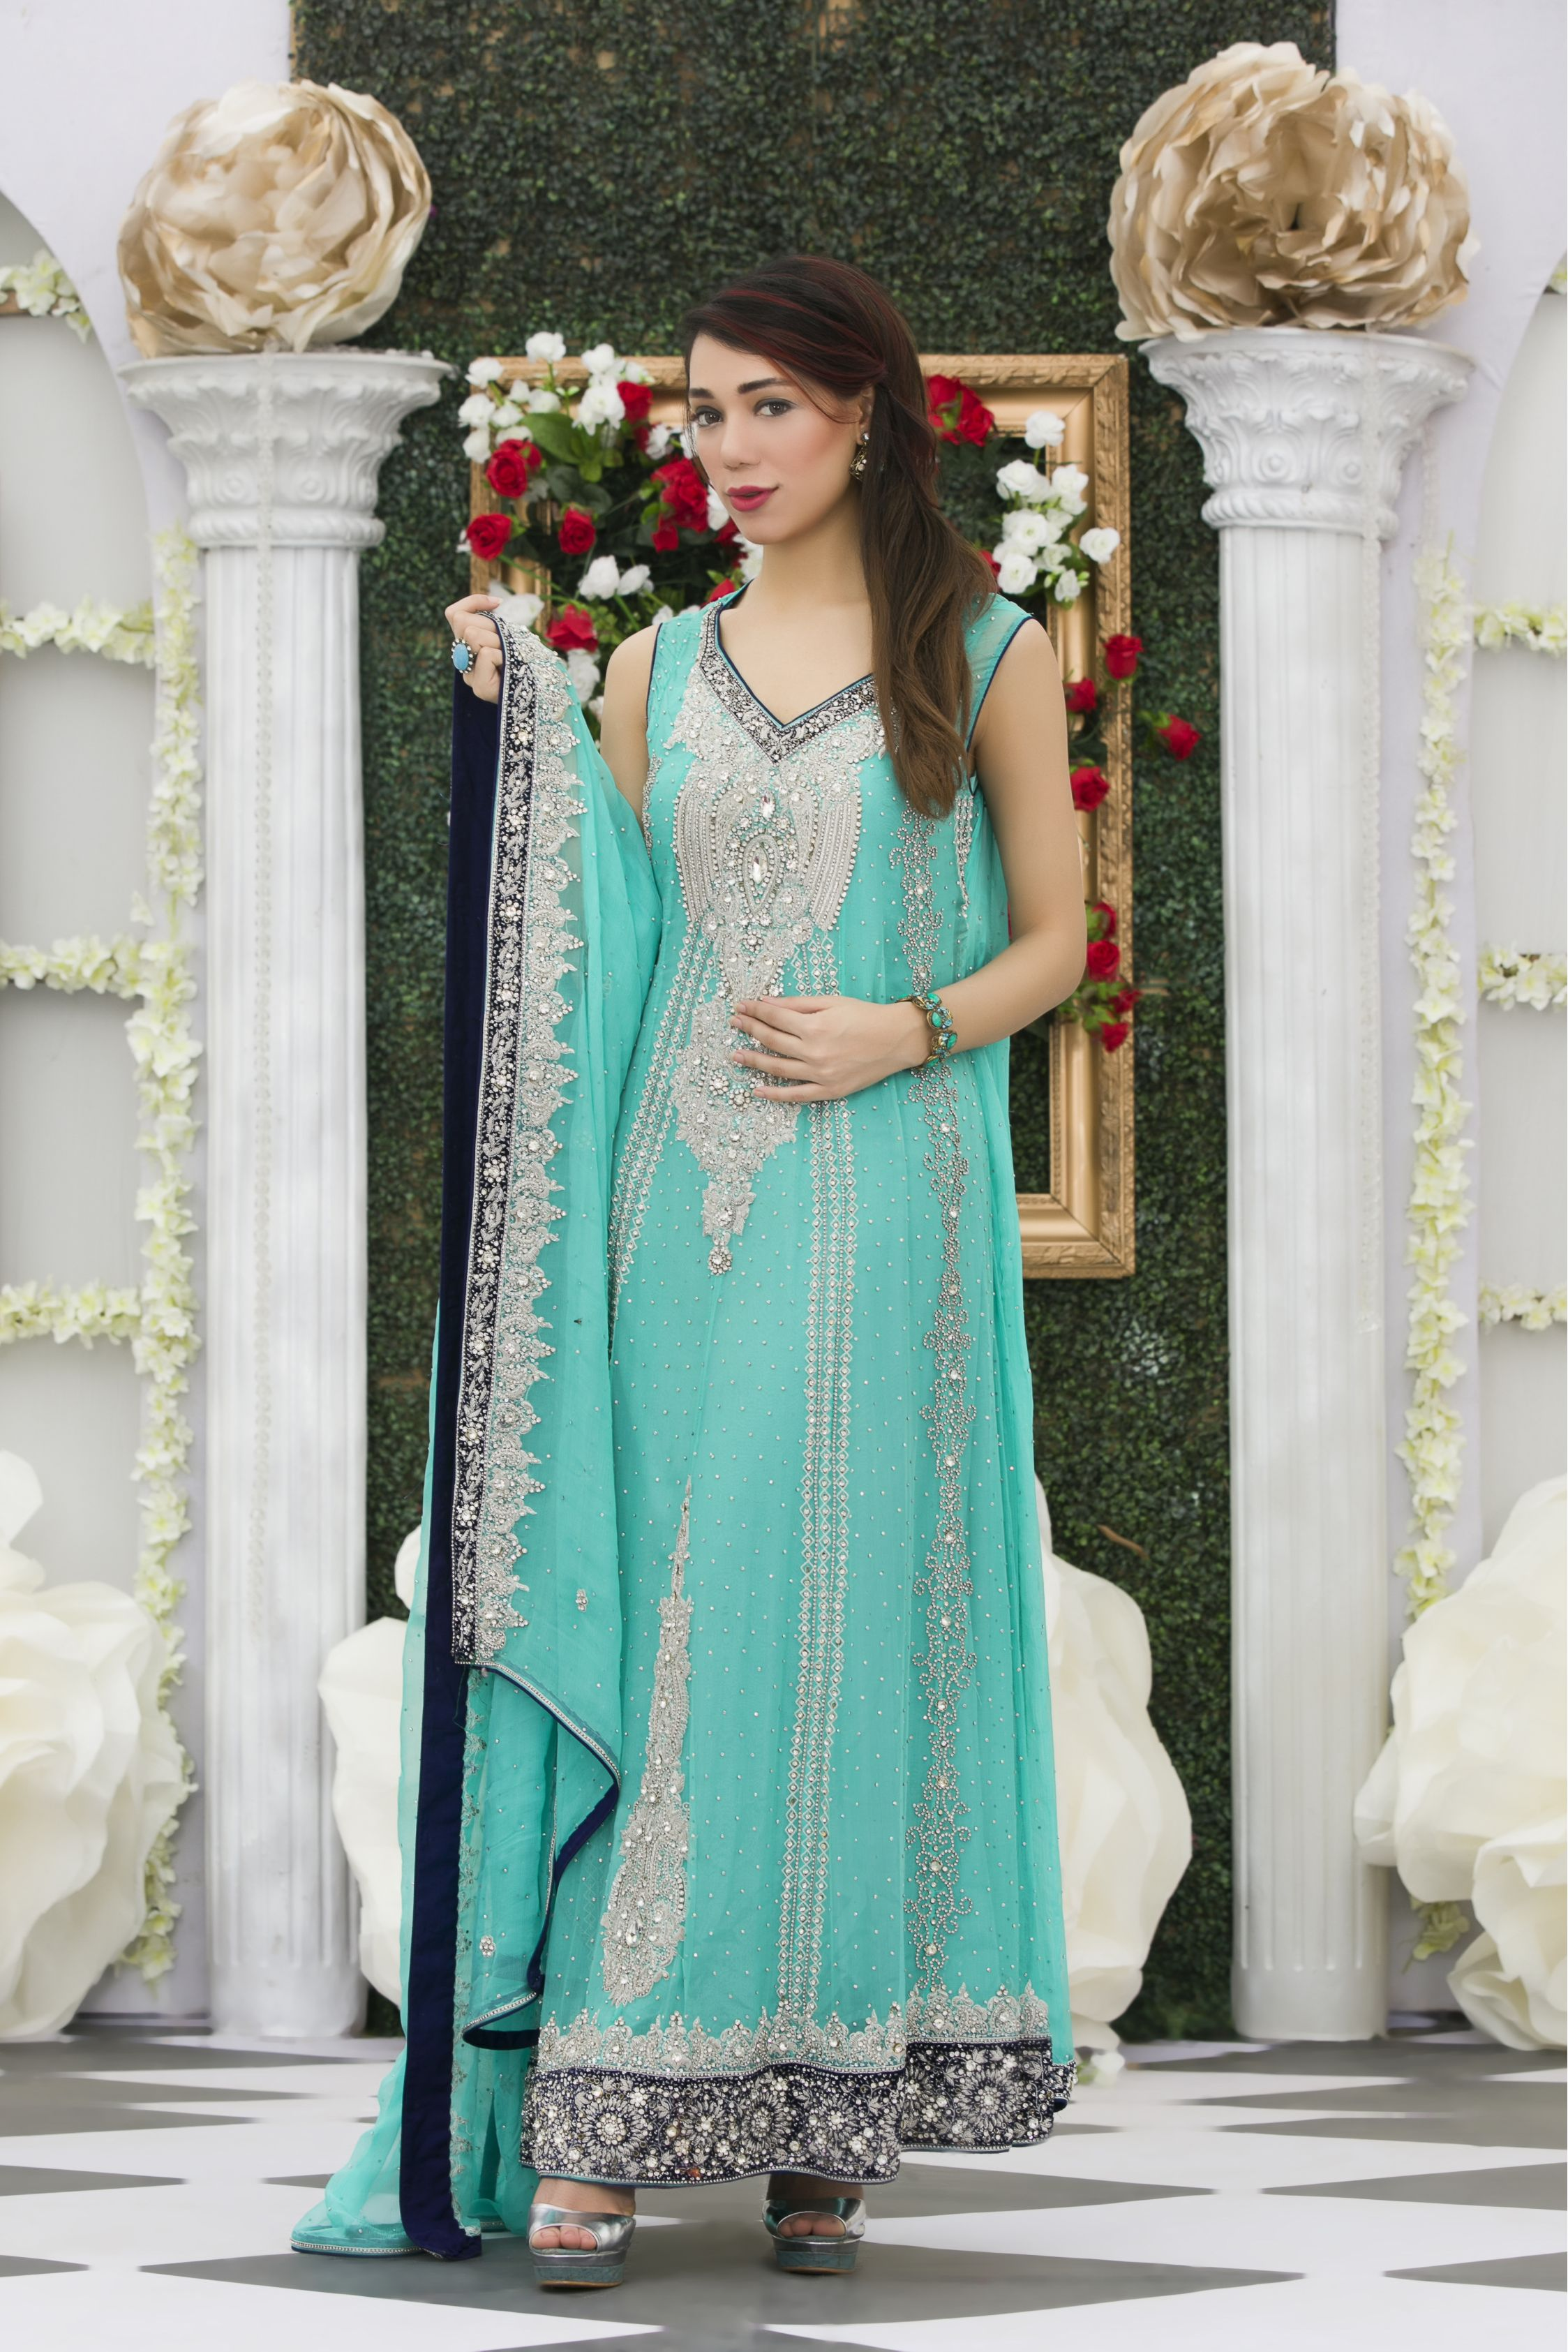 EXCLUSIVE LIGHT FEEROZI BRIDAL DRESS - Exclusive Online Boutique